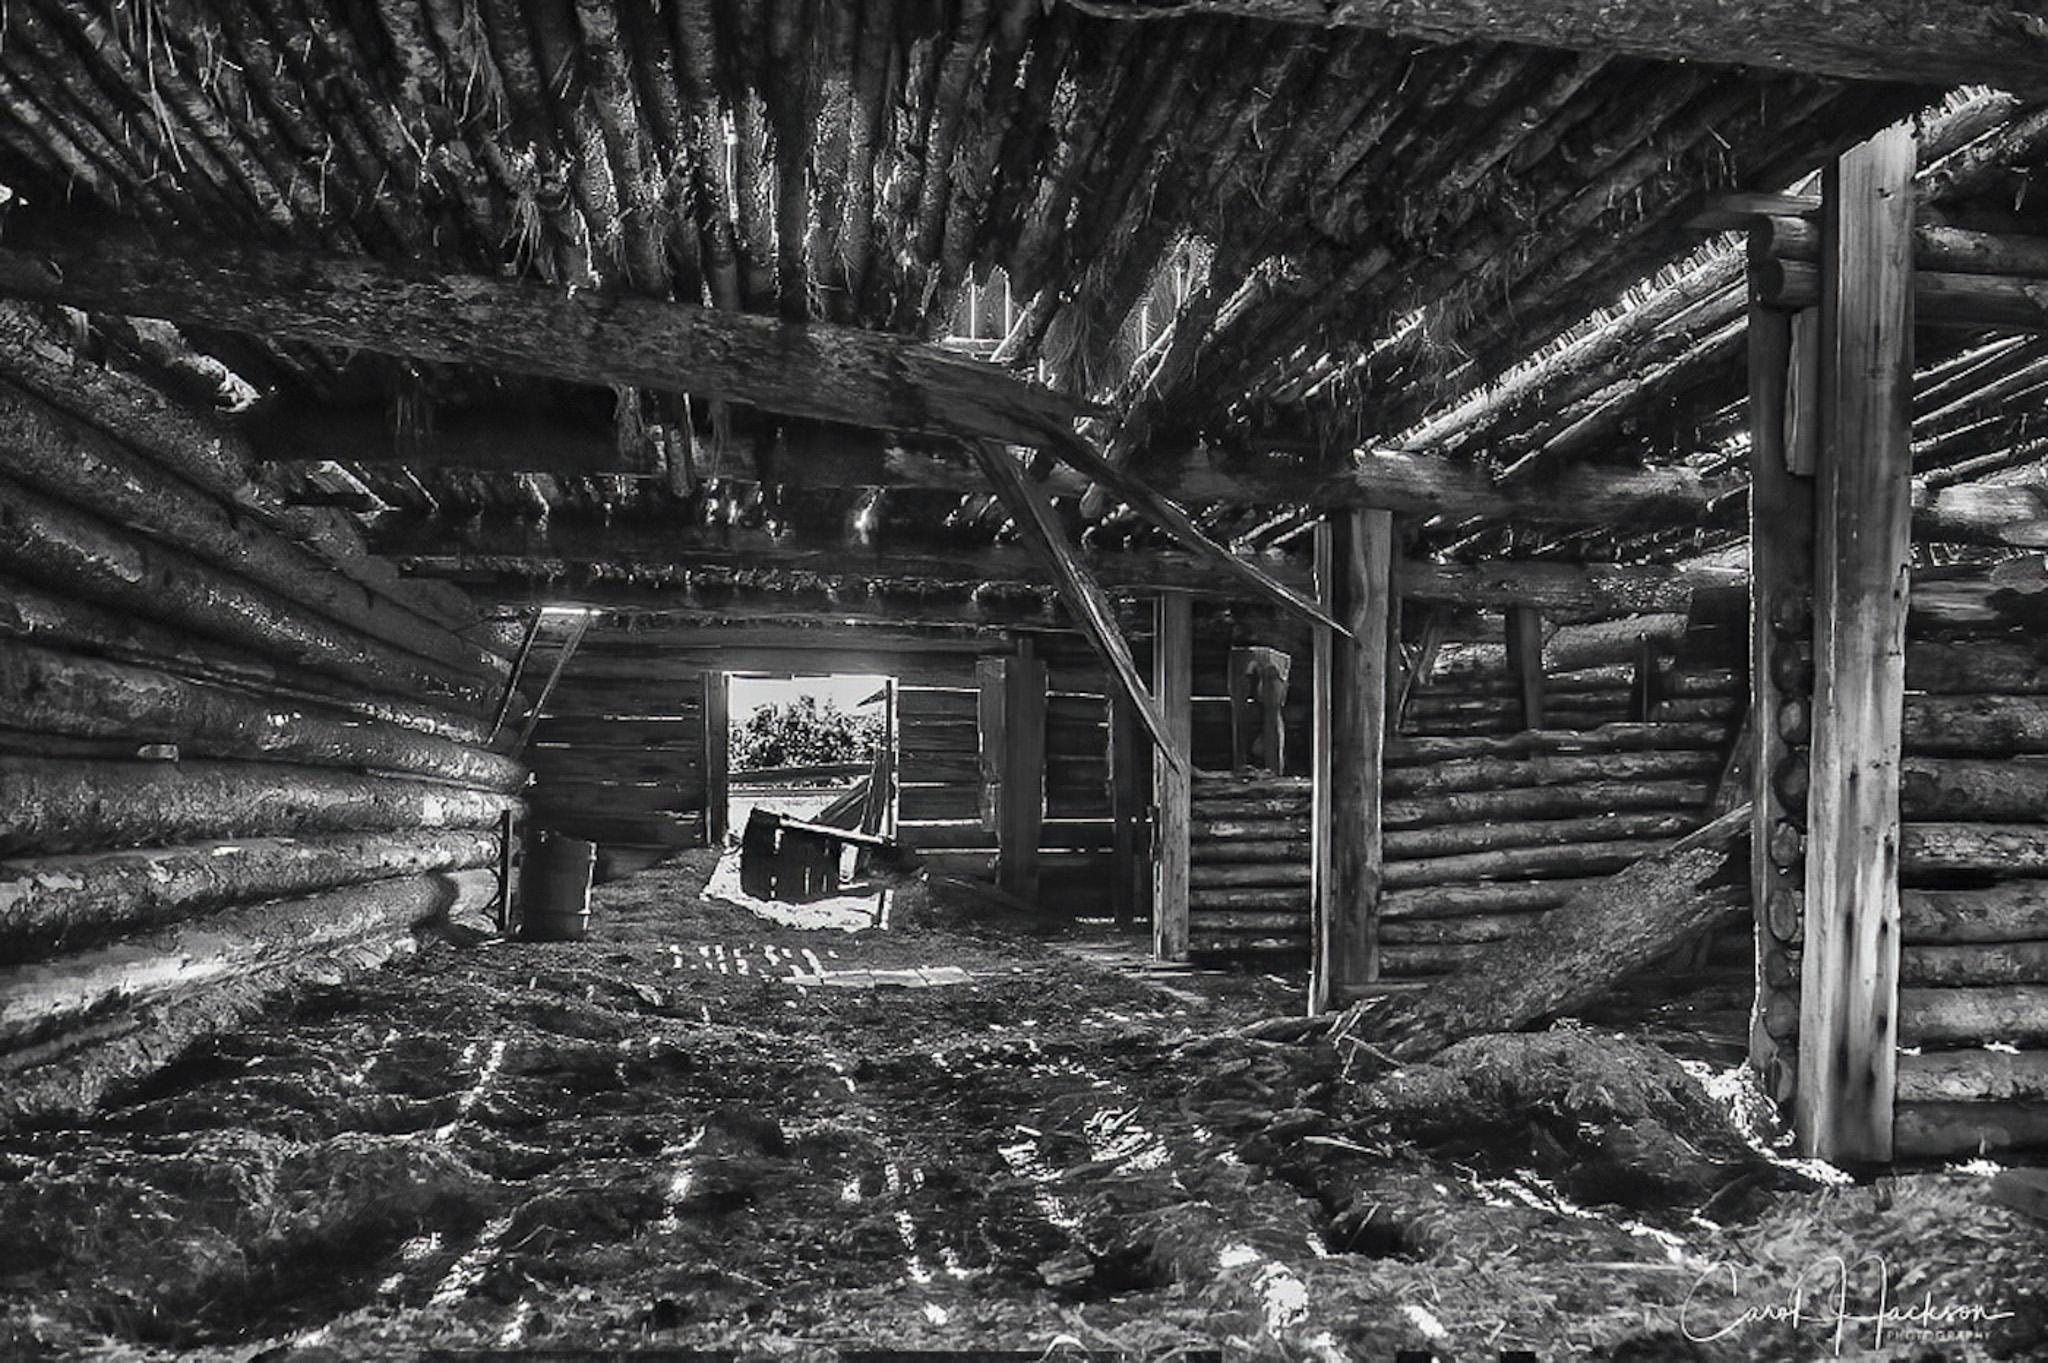 CJJ-Inside the Barn